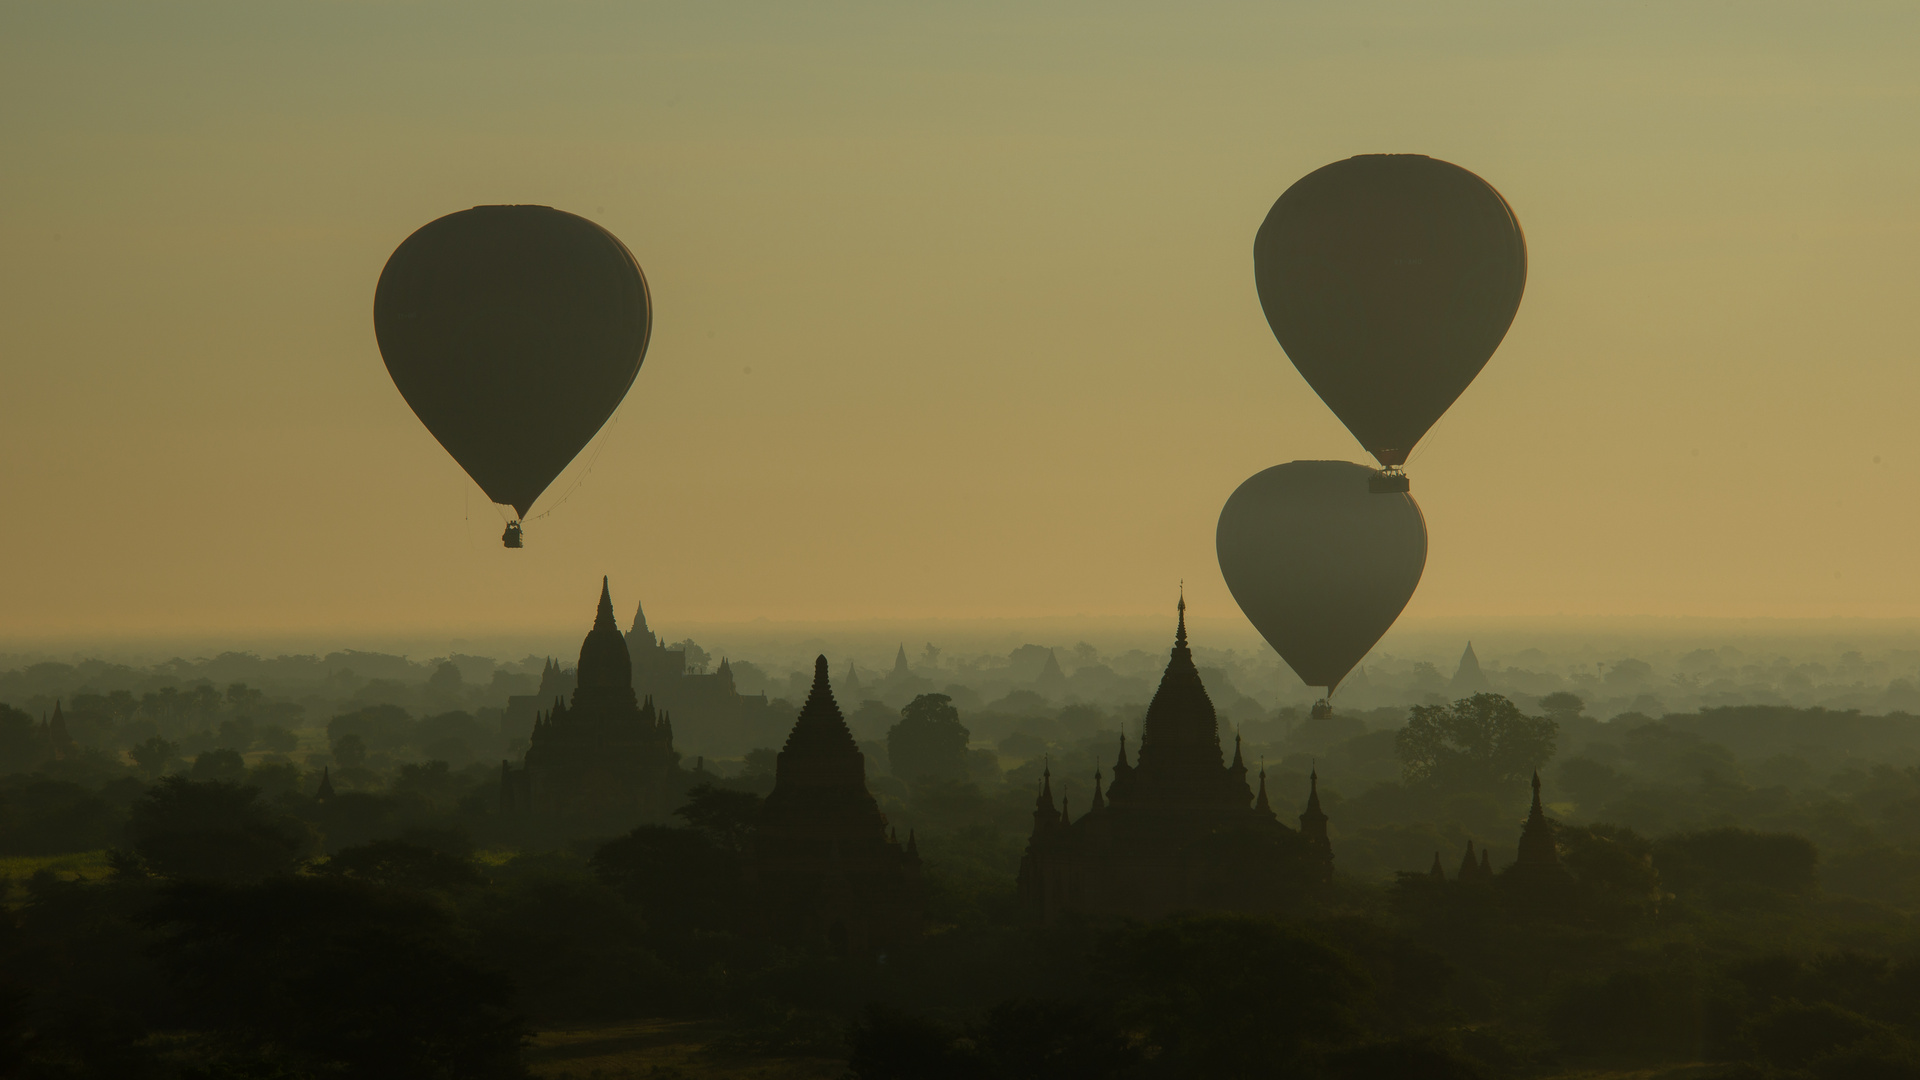 Baloon over Bagan